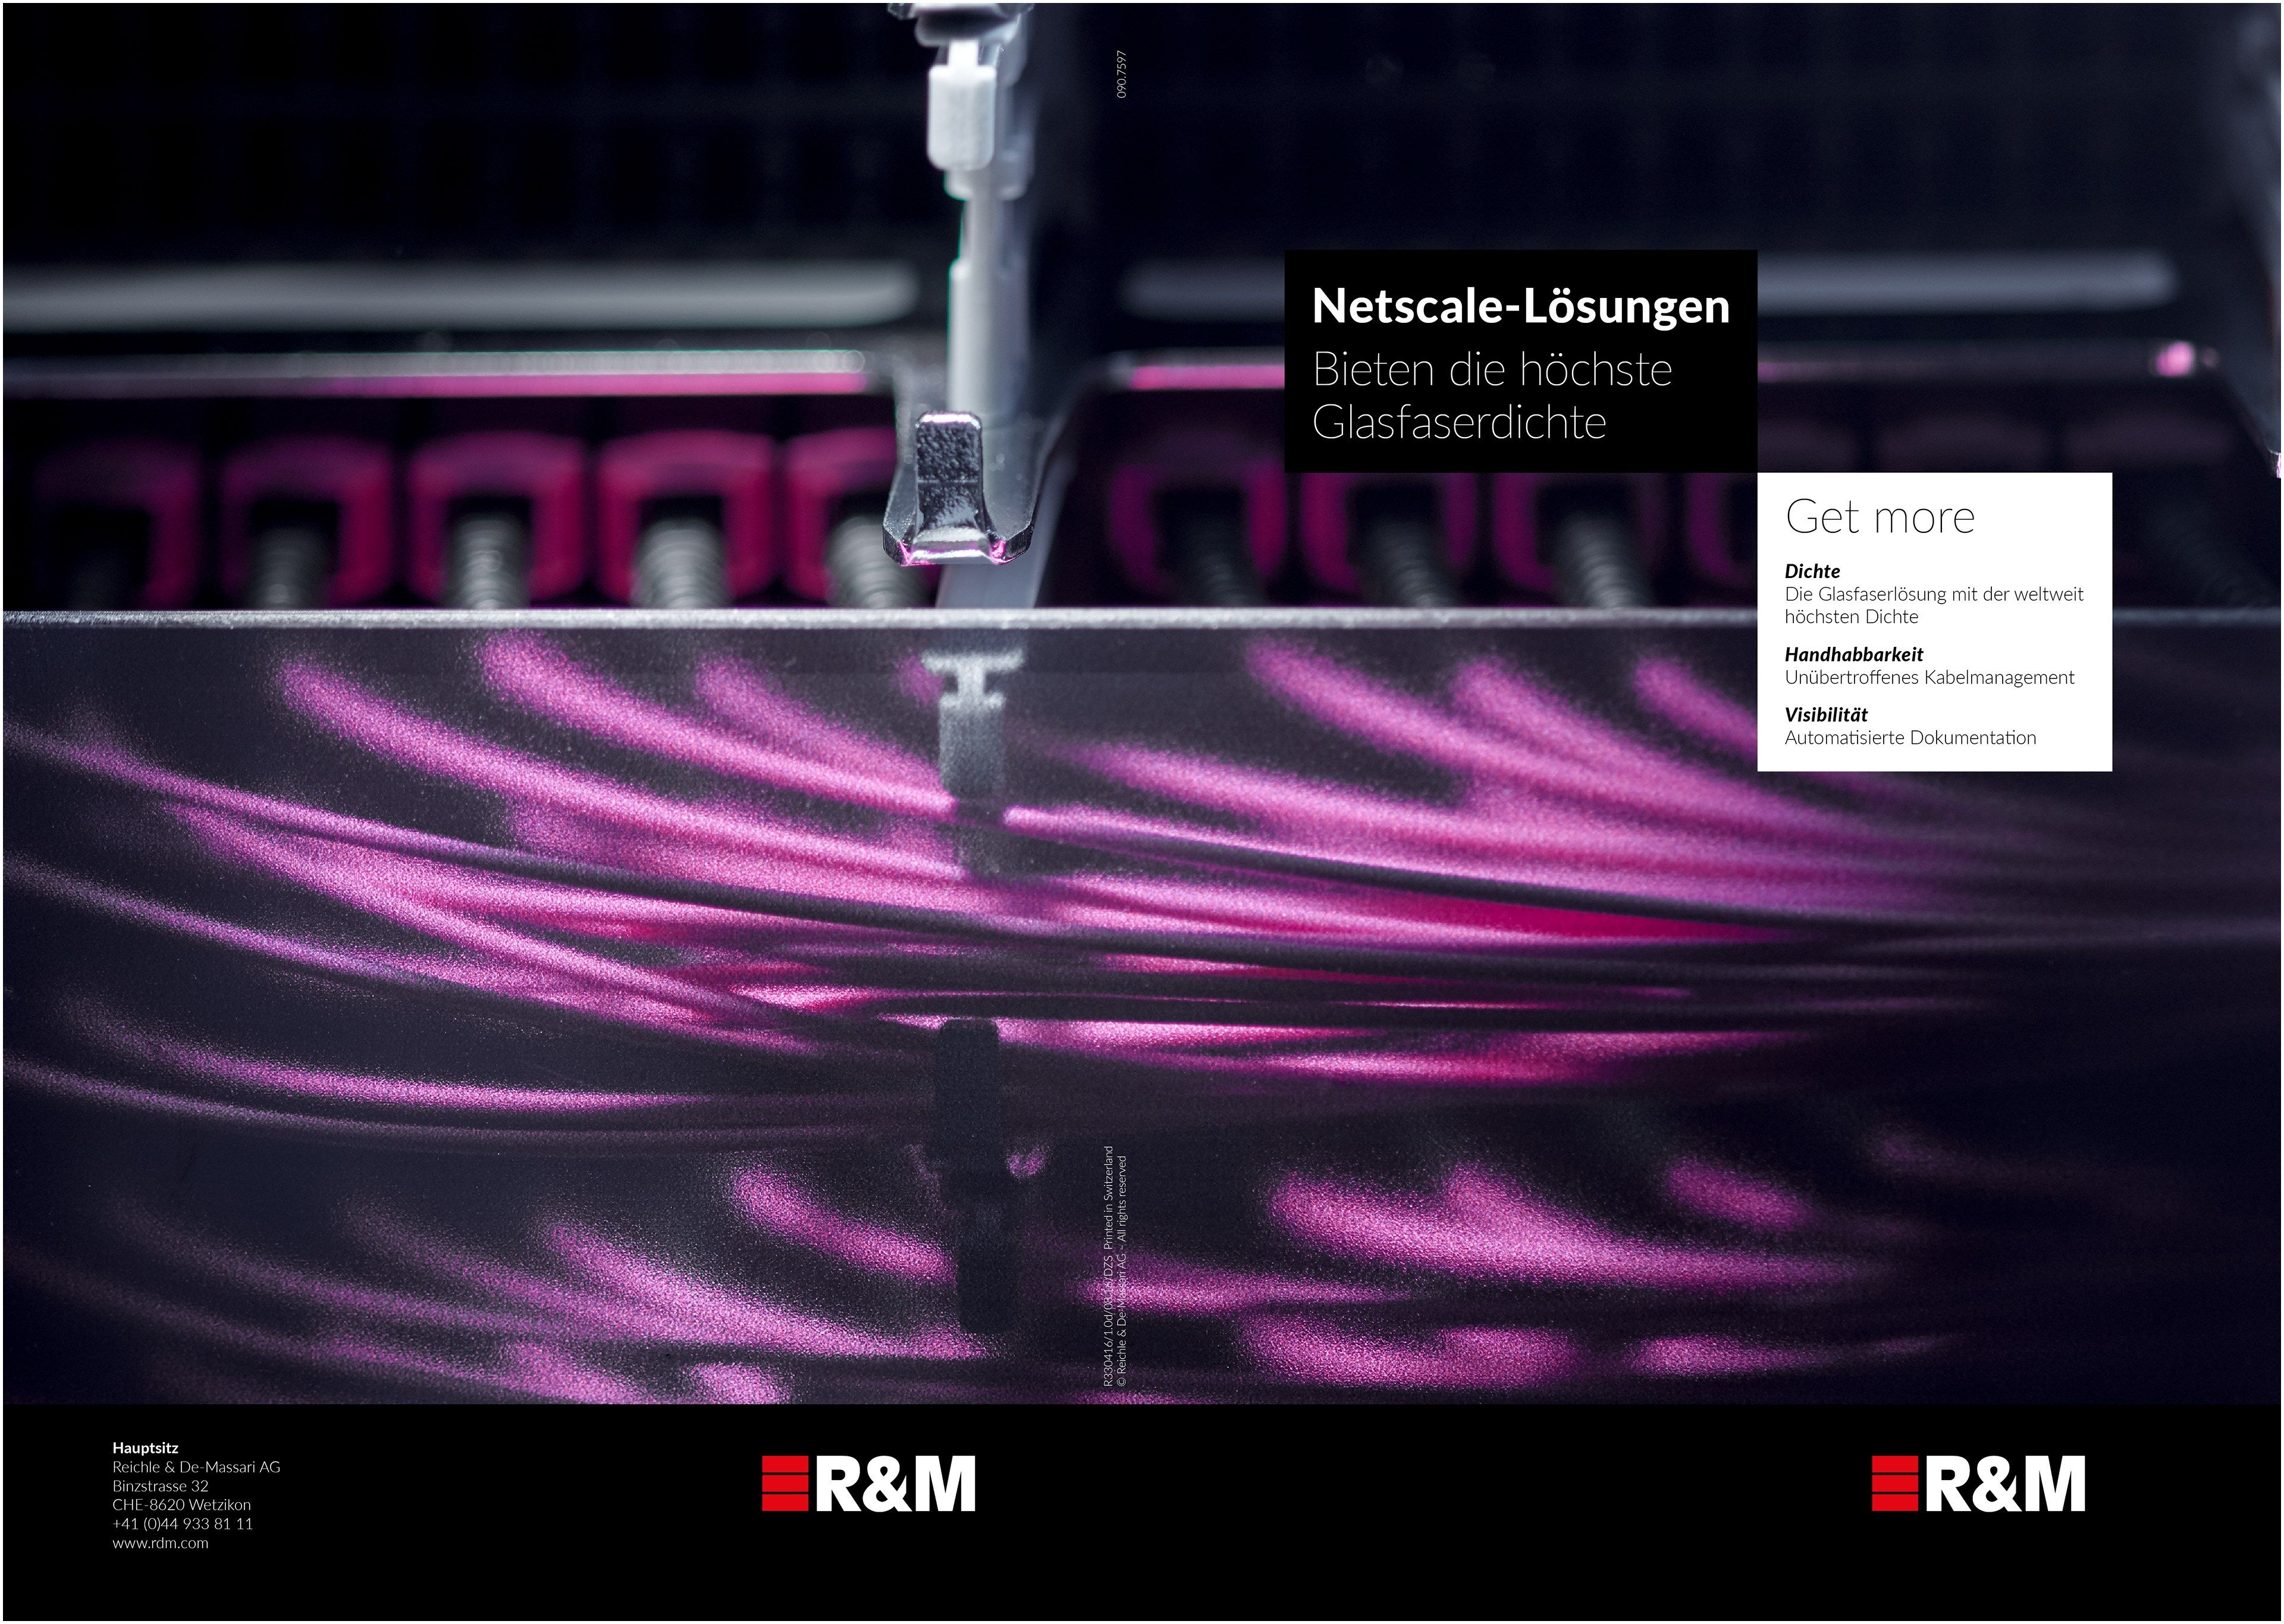 Best Technology Magazines Die Fotografen Ag Syncolor Ag